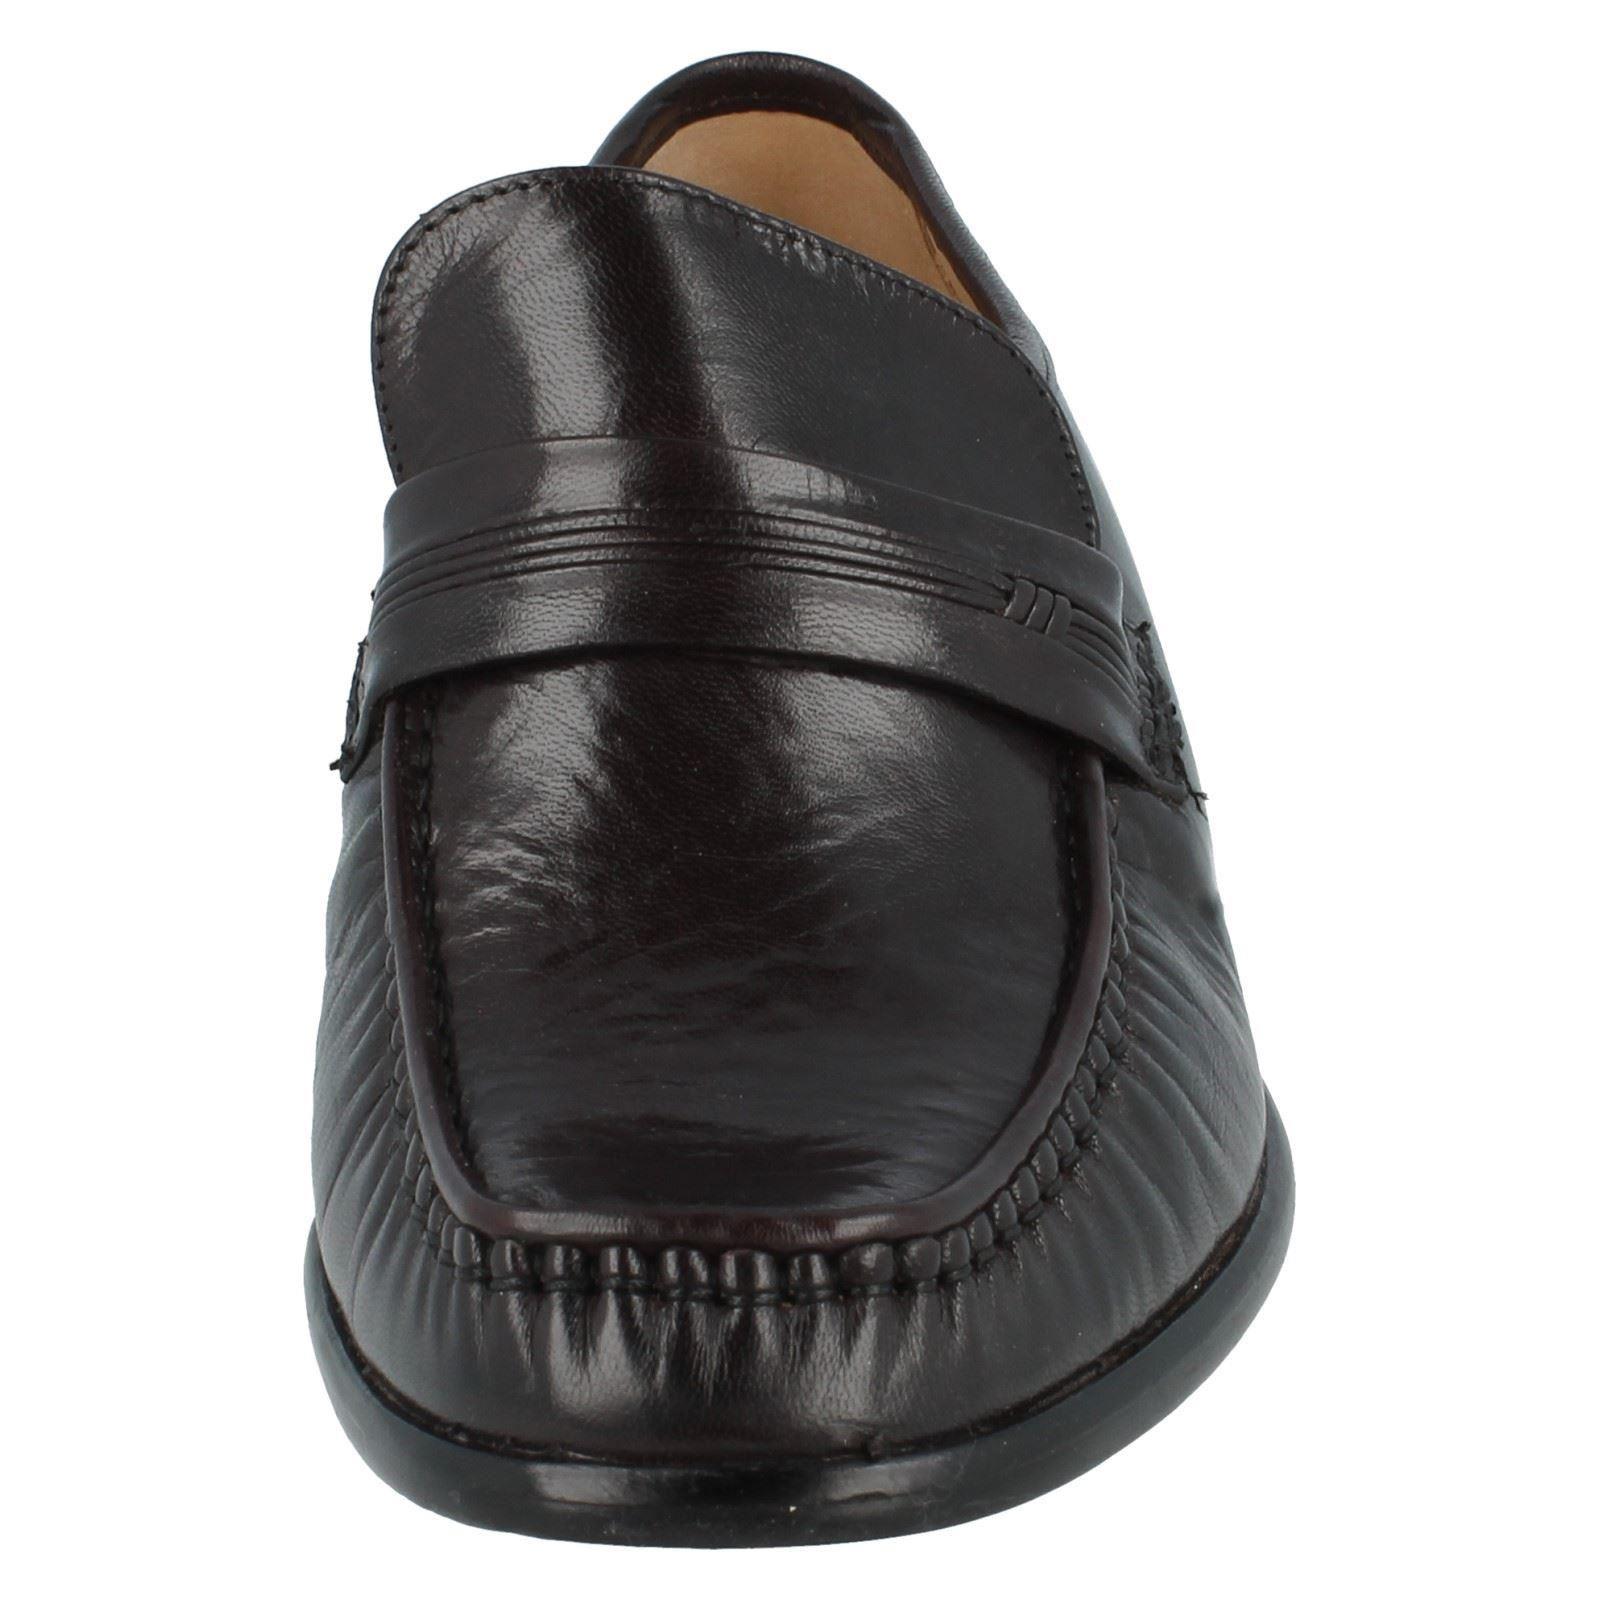 Uomo Style Grenson Moccasins 'Clapham' The Style Uomo  K 2f304f